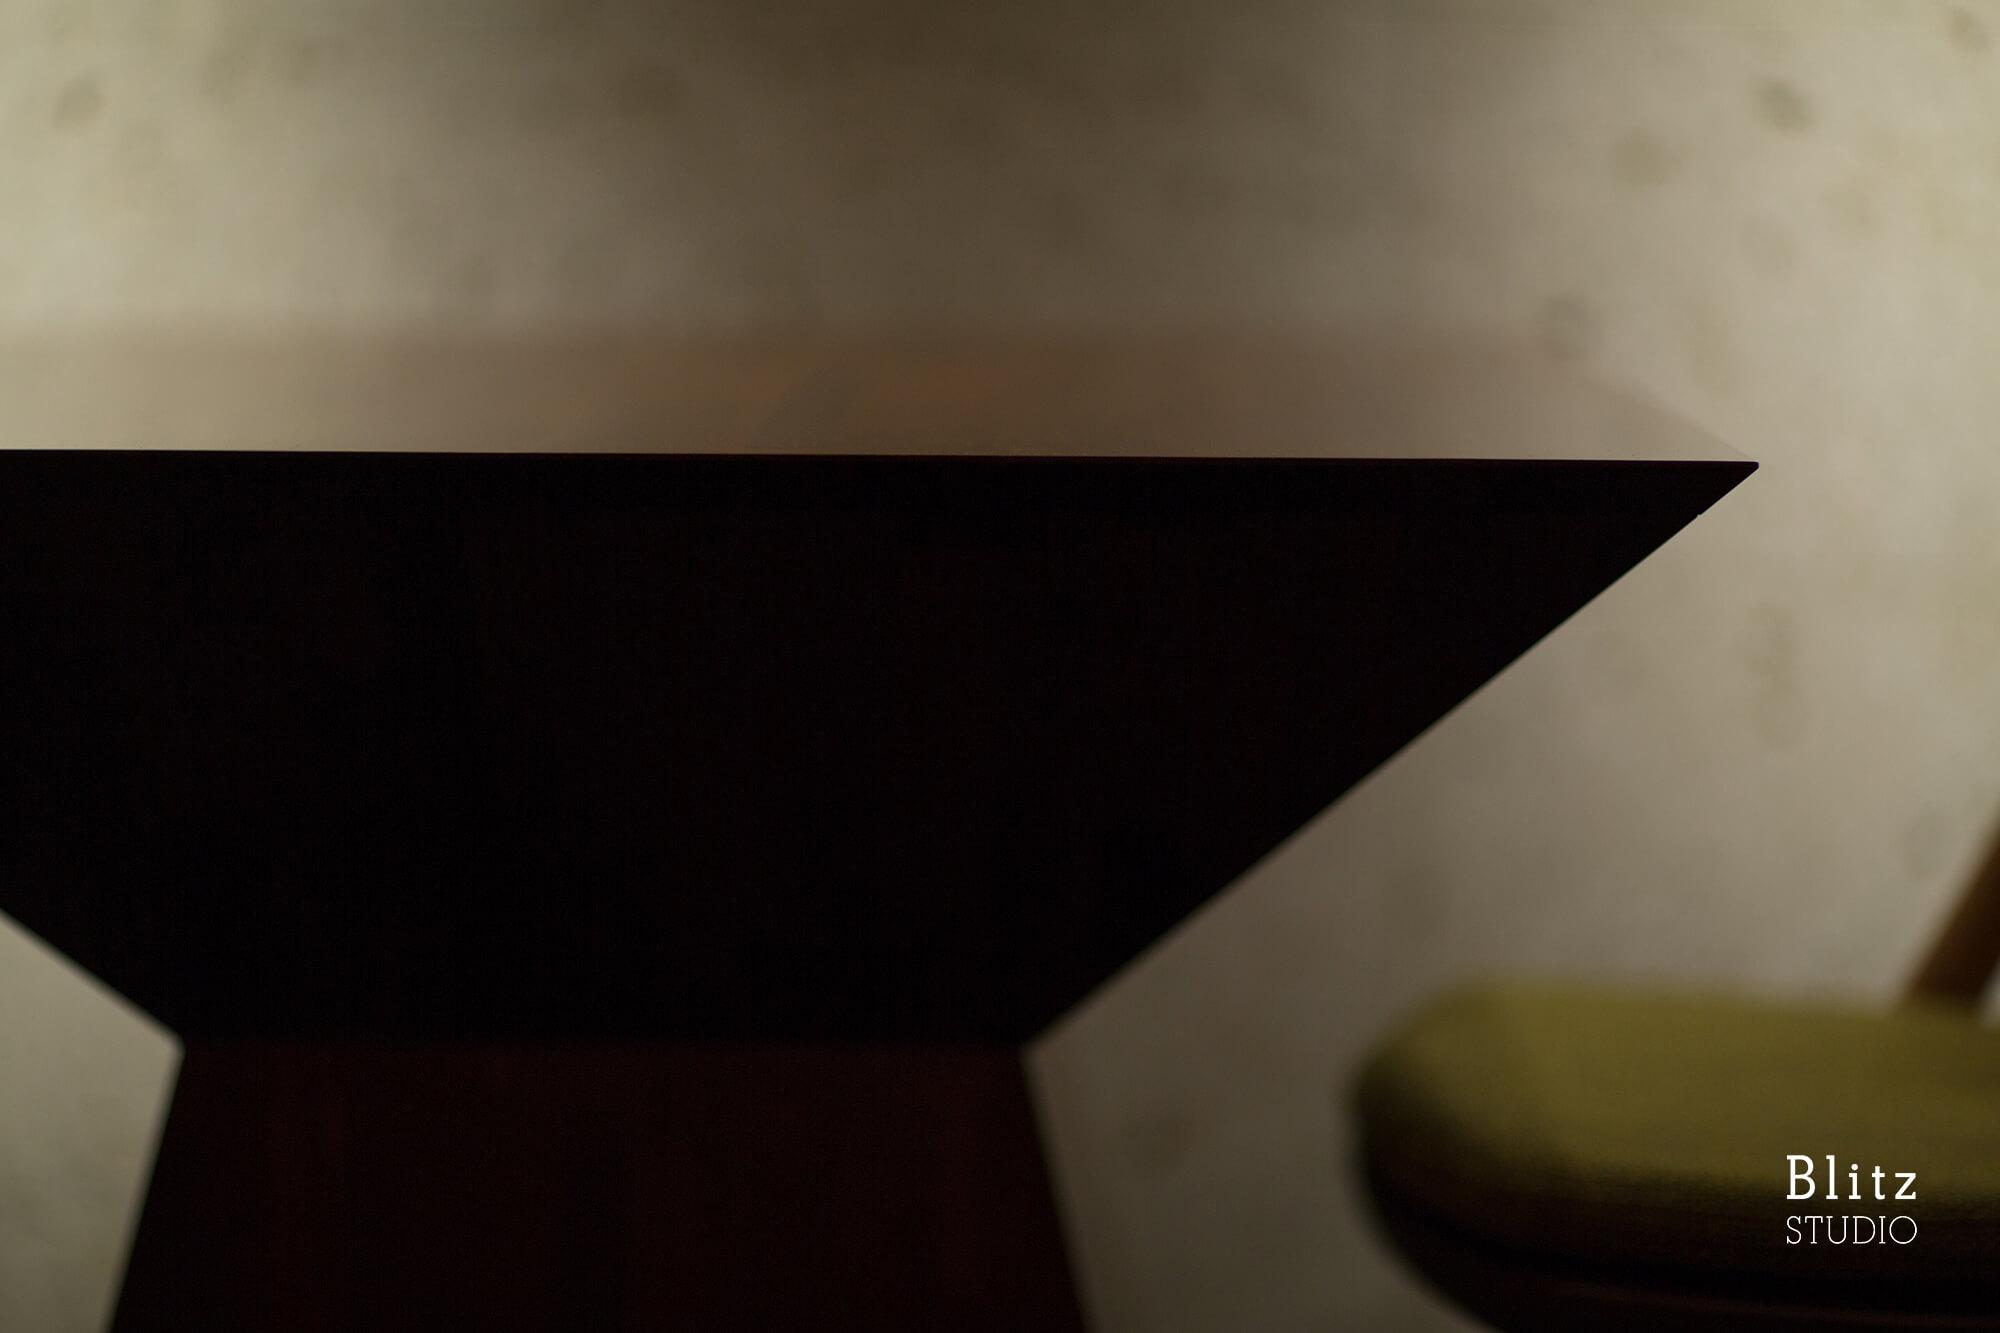 『美酒佳肴 庵』建築写真・竣工写真・インテリア写真12